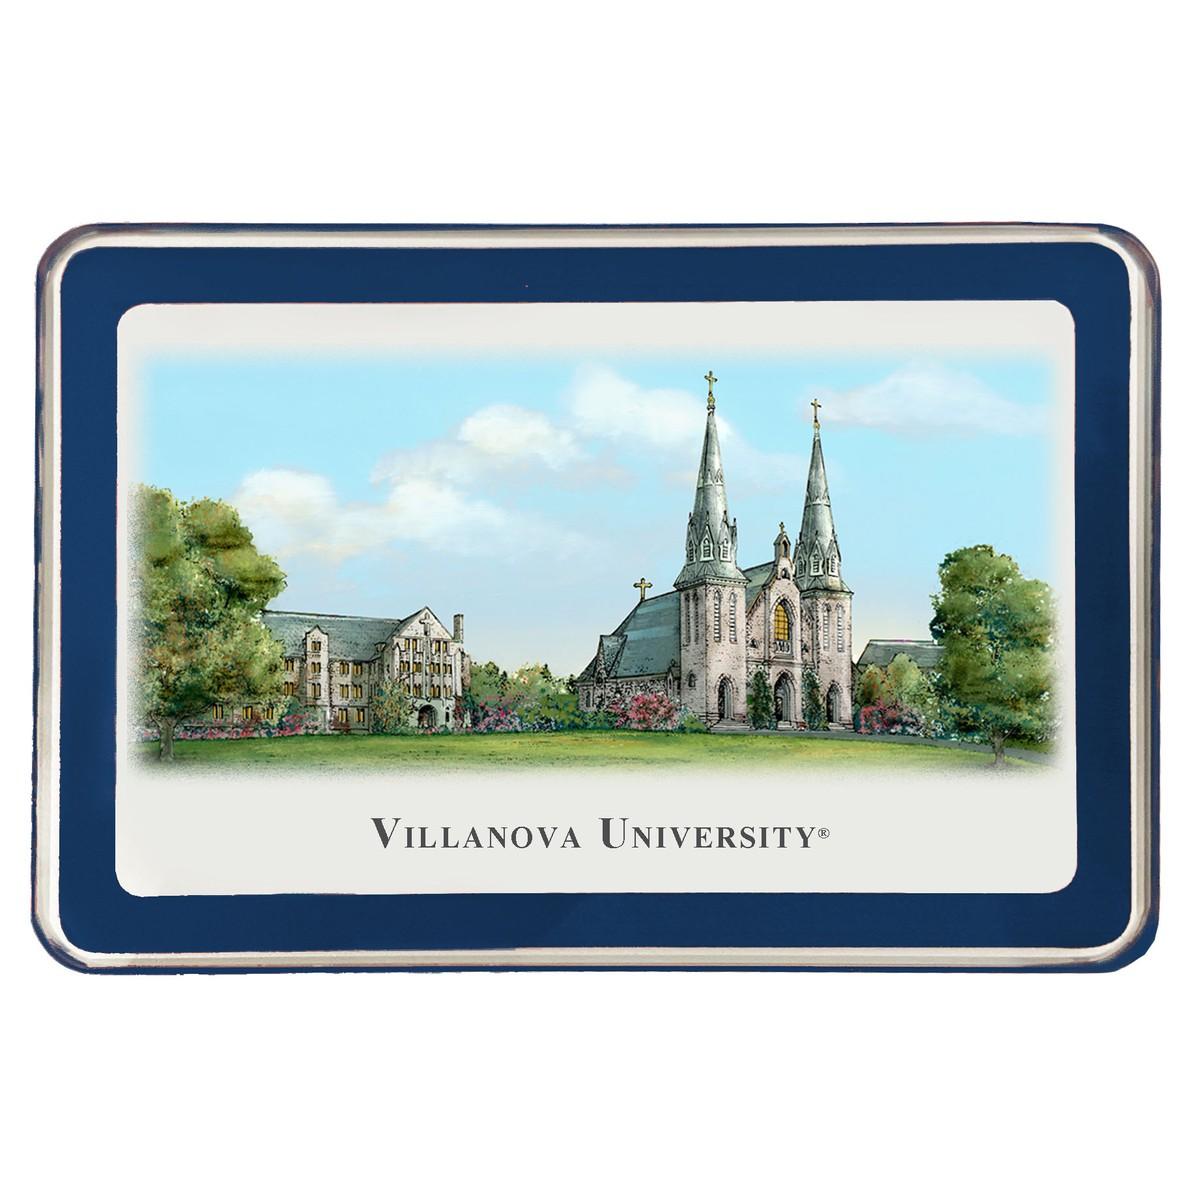 Villanova University Eglomise Paperweight At M Lahart Amp Co